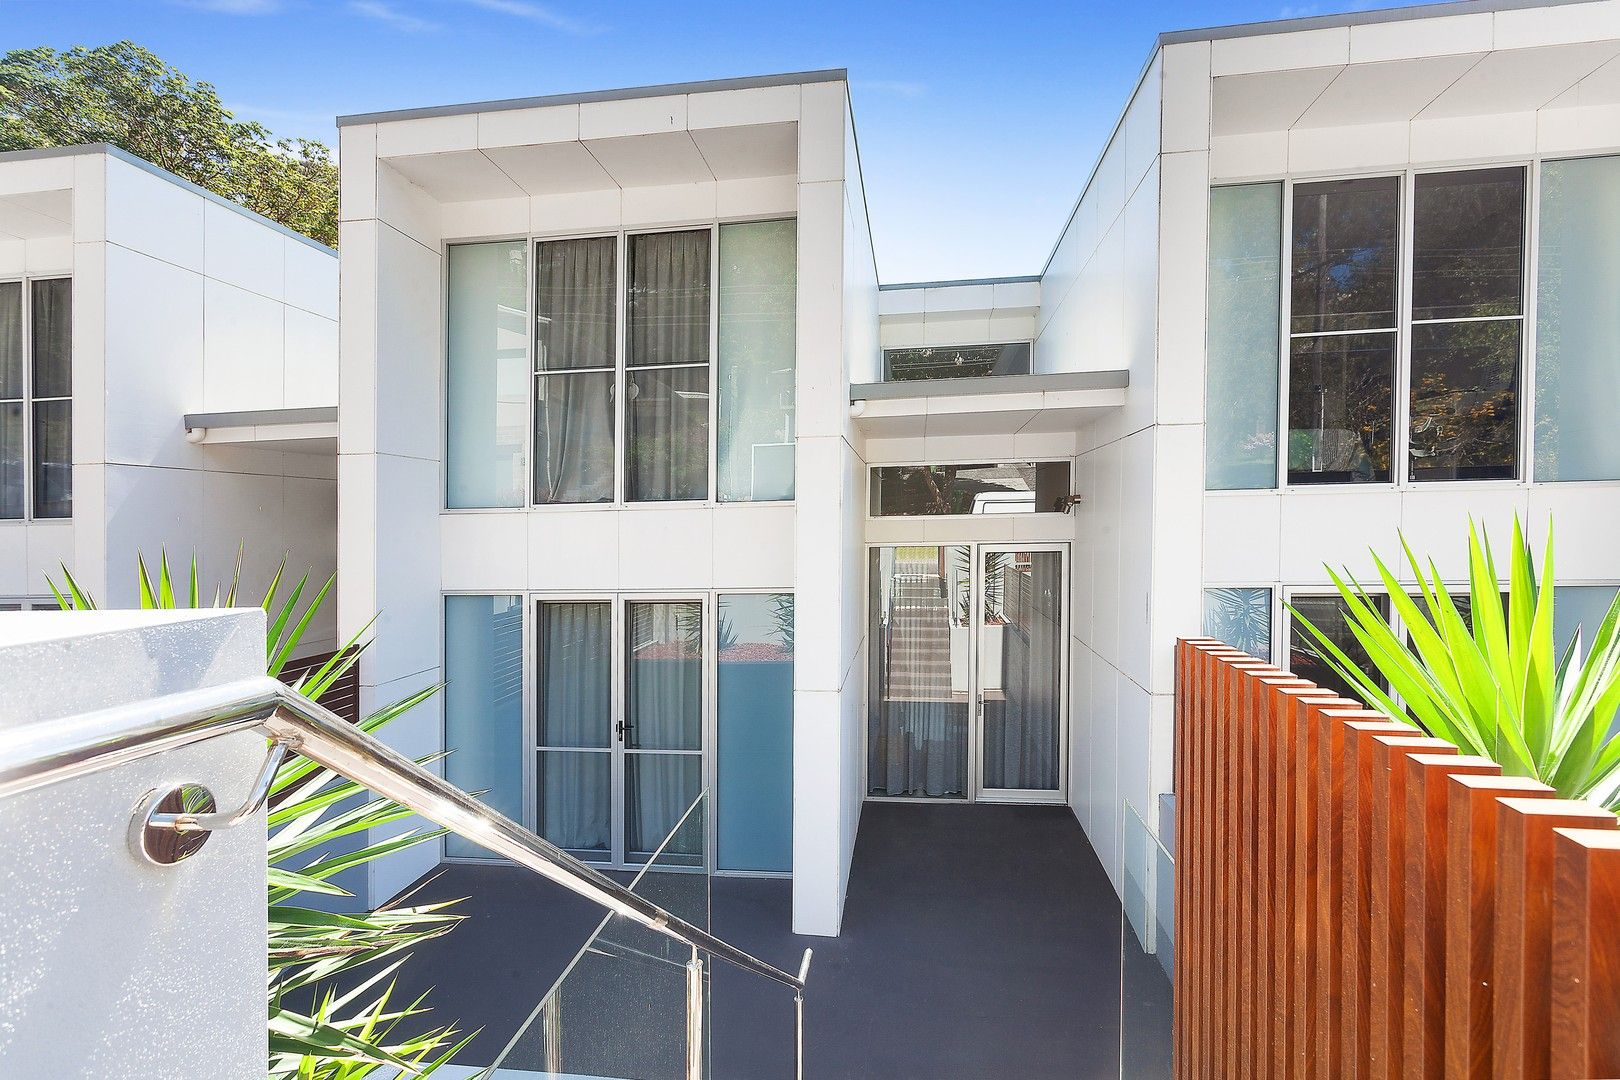 2/21 Auld Street, Terrigal NSW 2260, Image 0